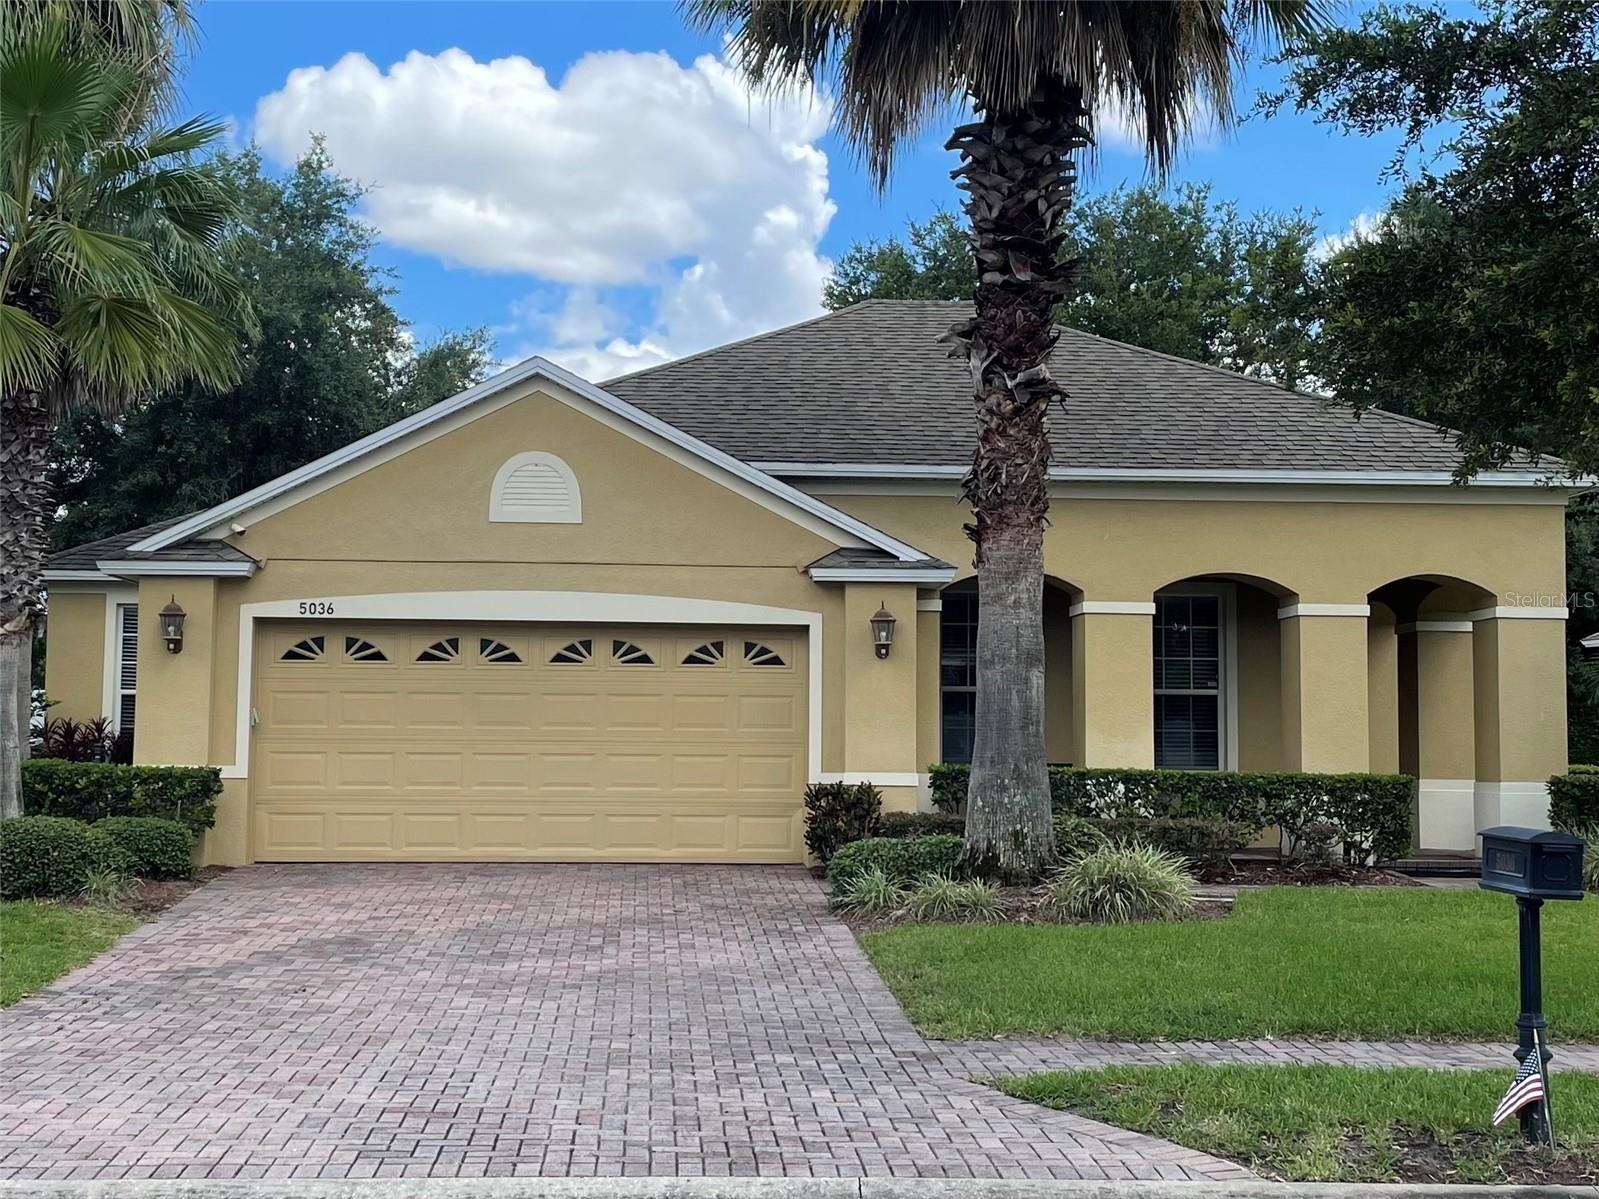 5036 LEGACY OAKS DRIVE, Orlando, FL 32839 - #: A4507296